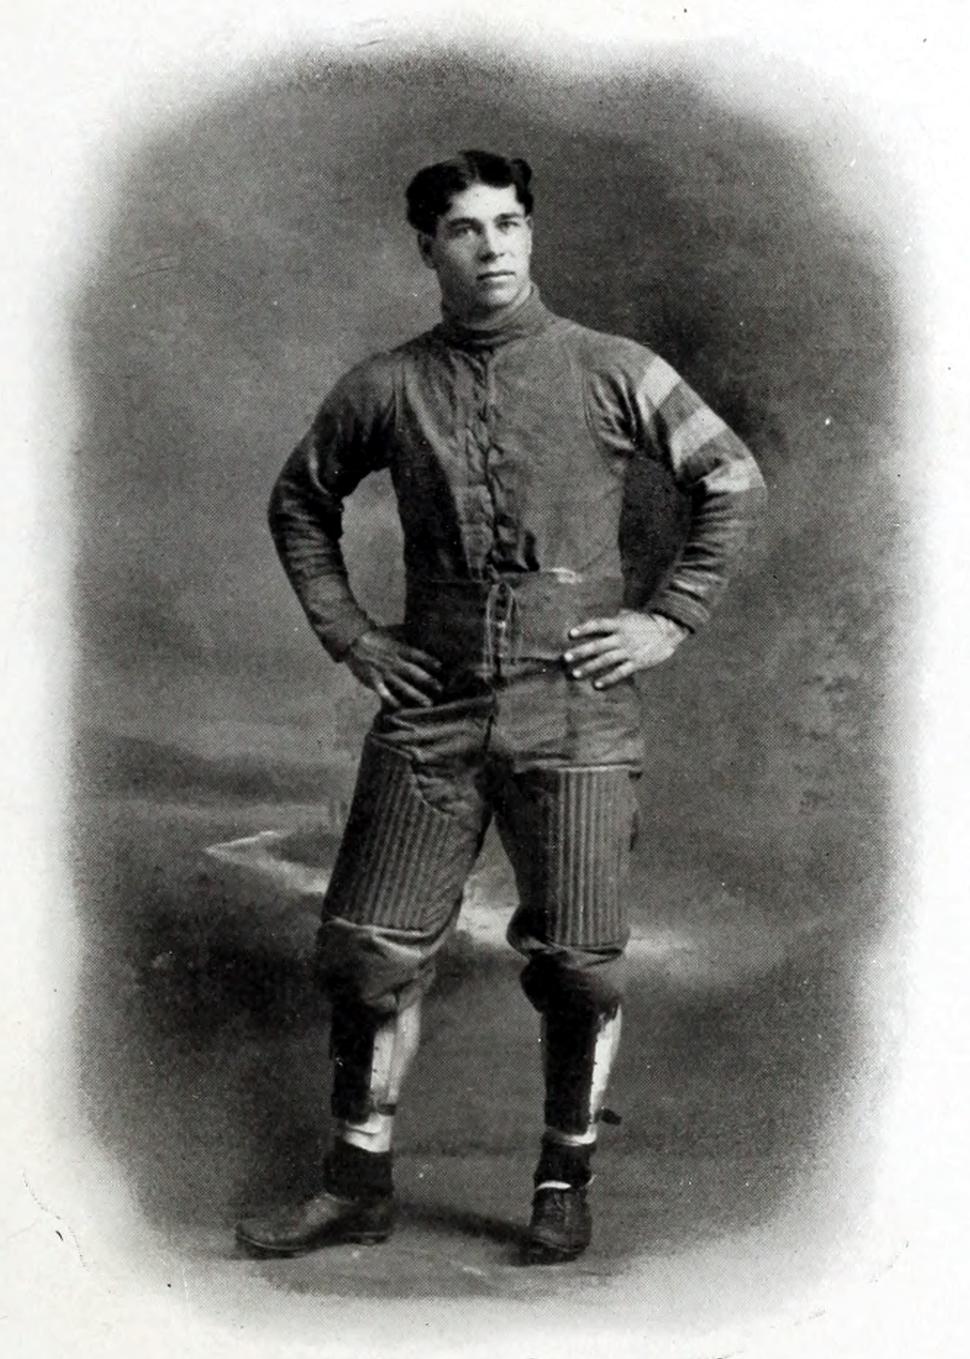 Fritz Furtick (Clemson College Annual 1907)